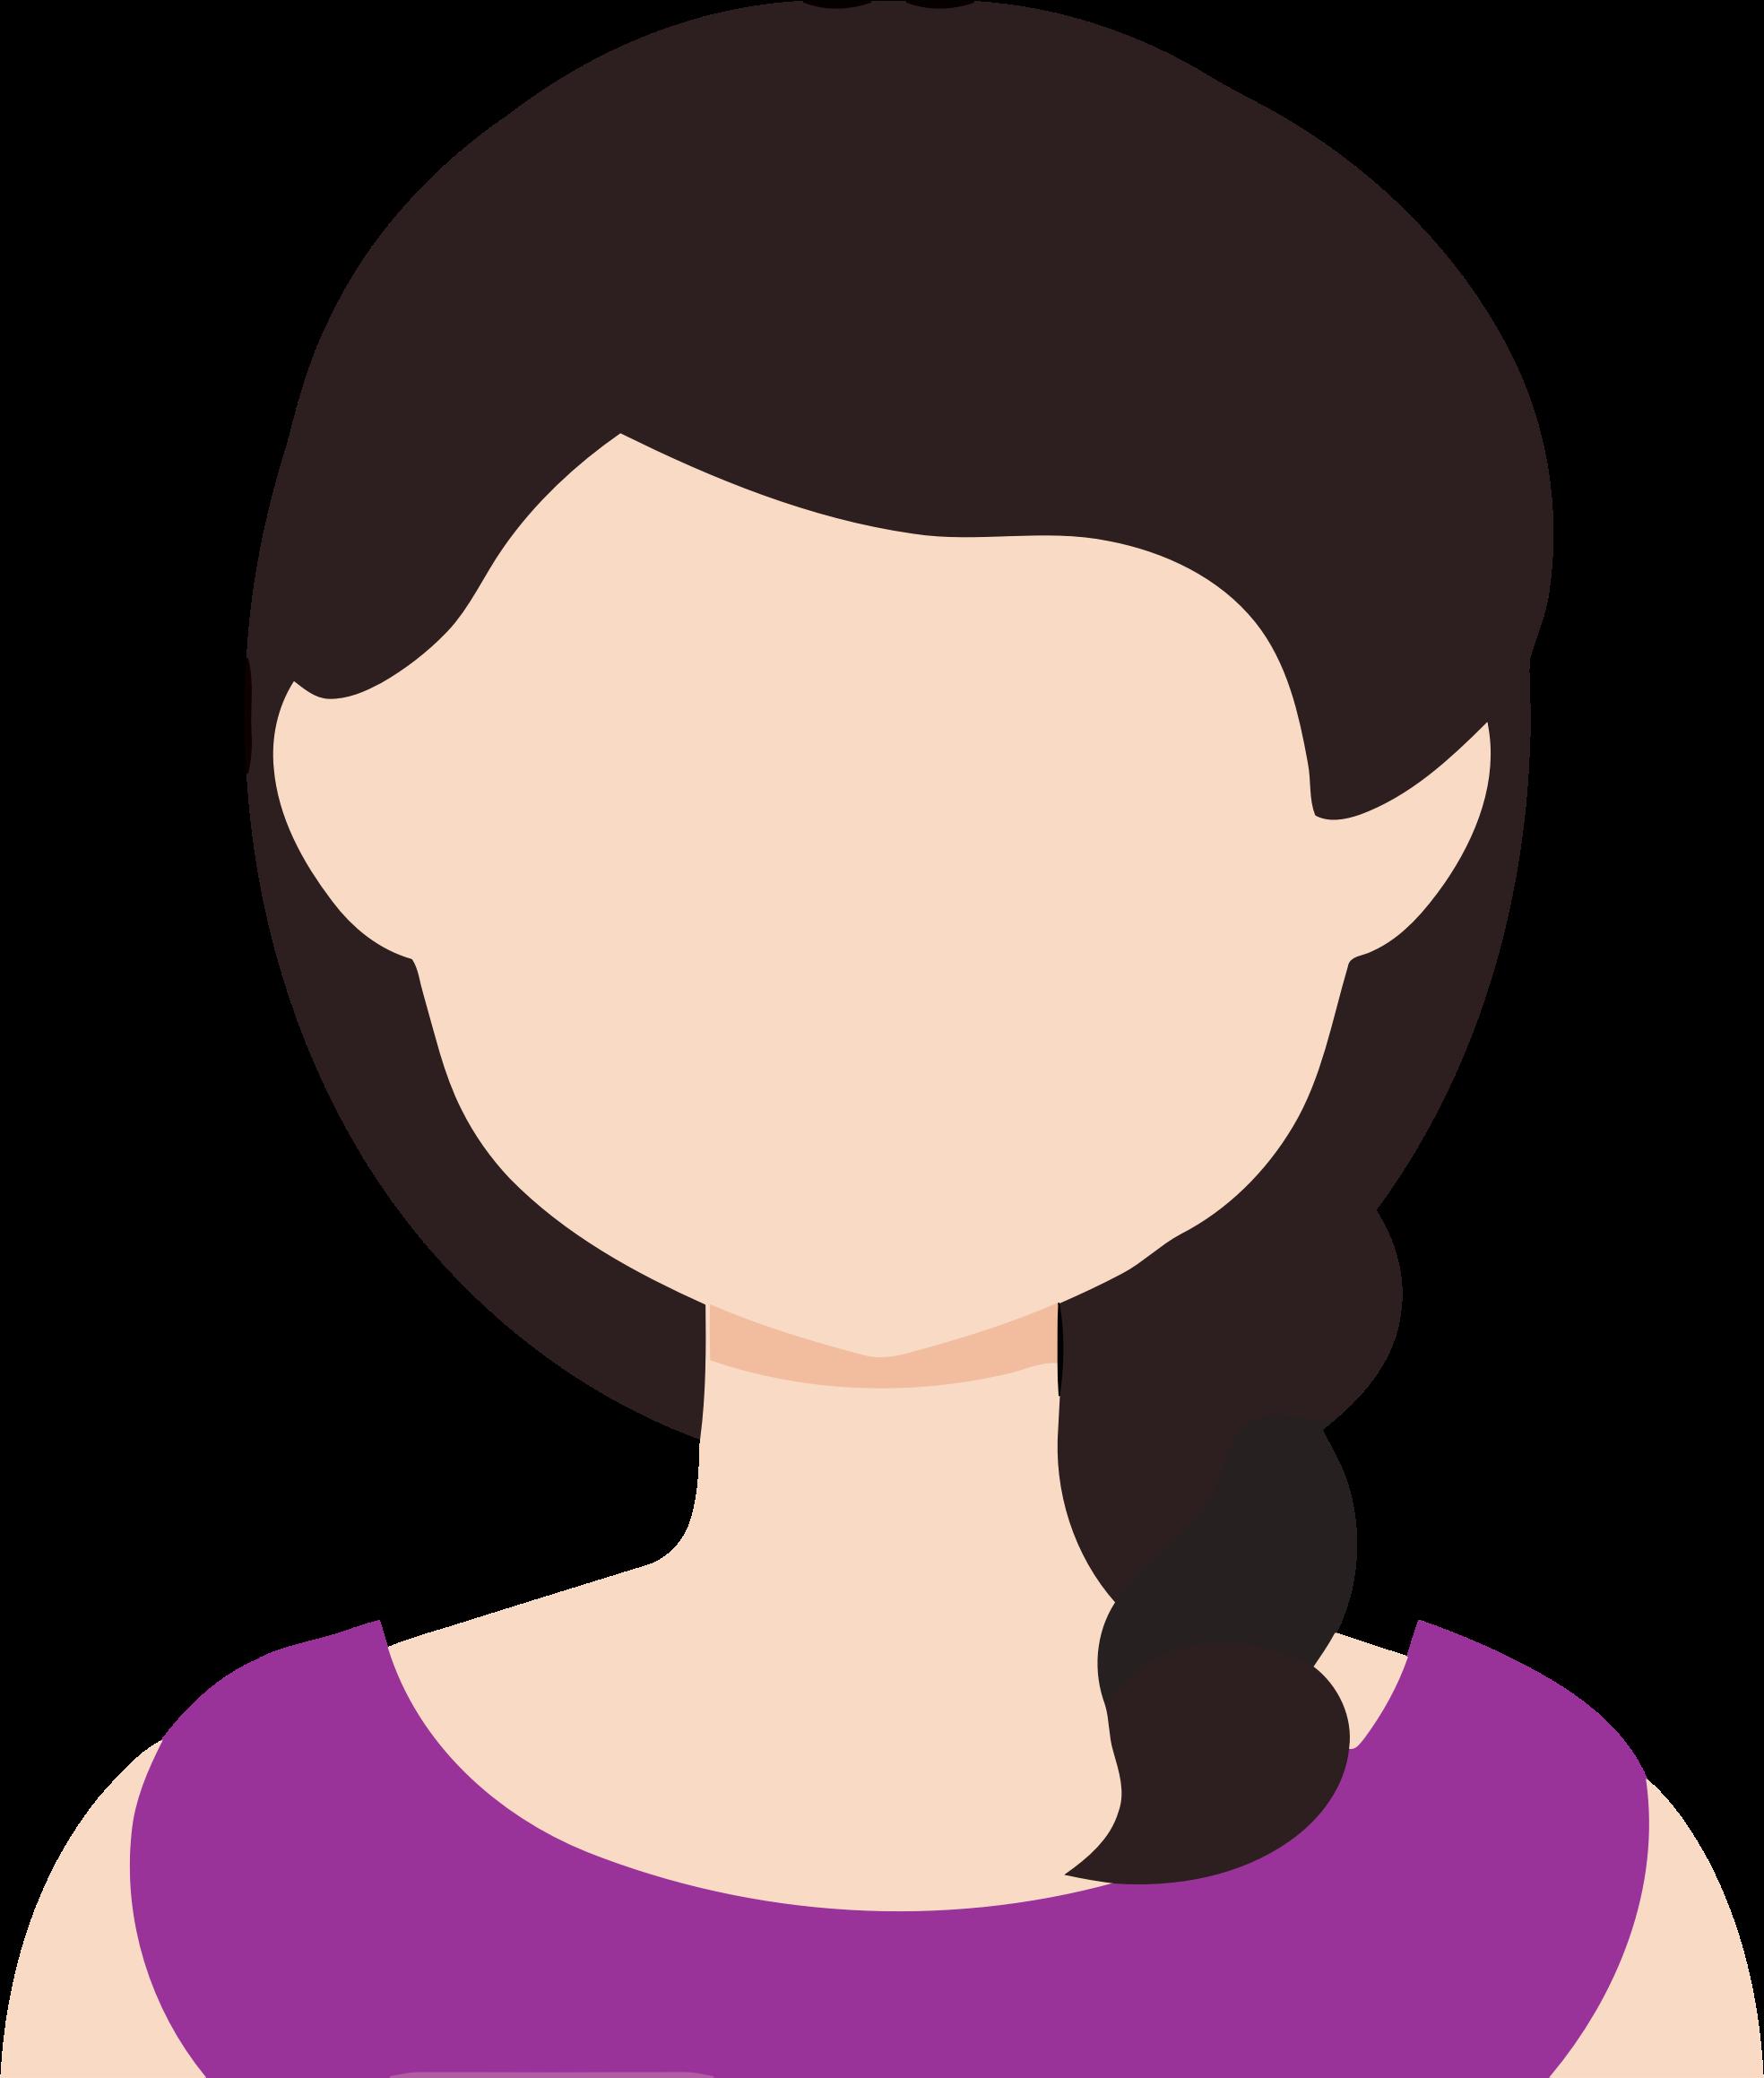 Female big image png. D20 clipart avatar